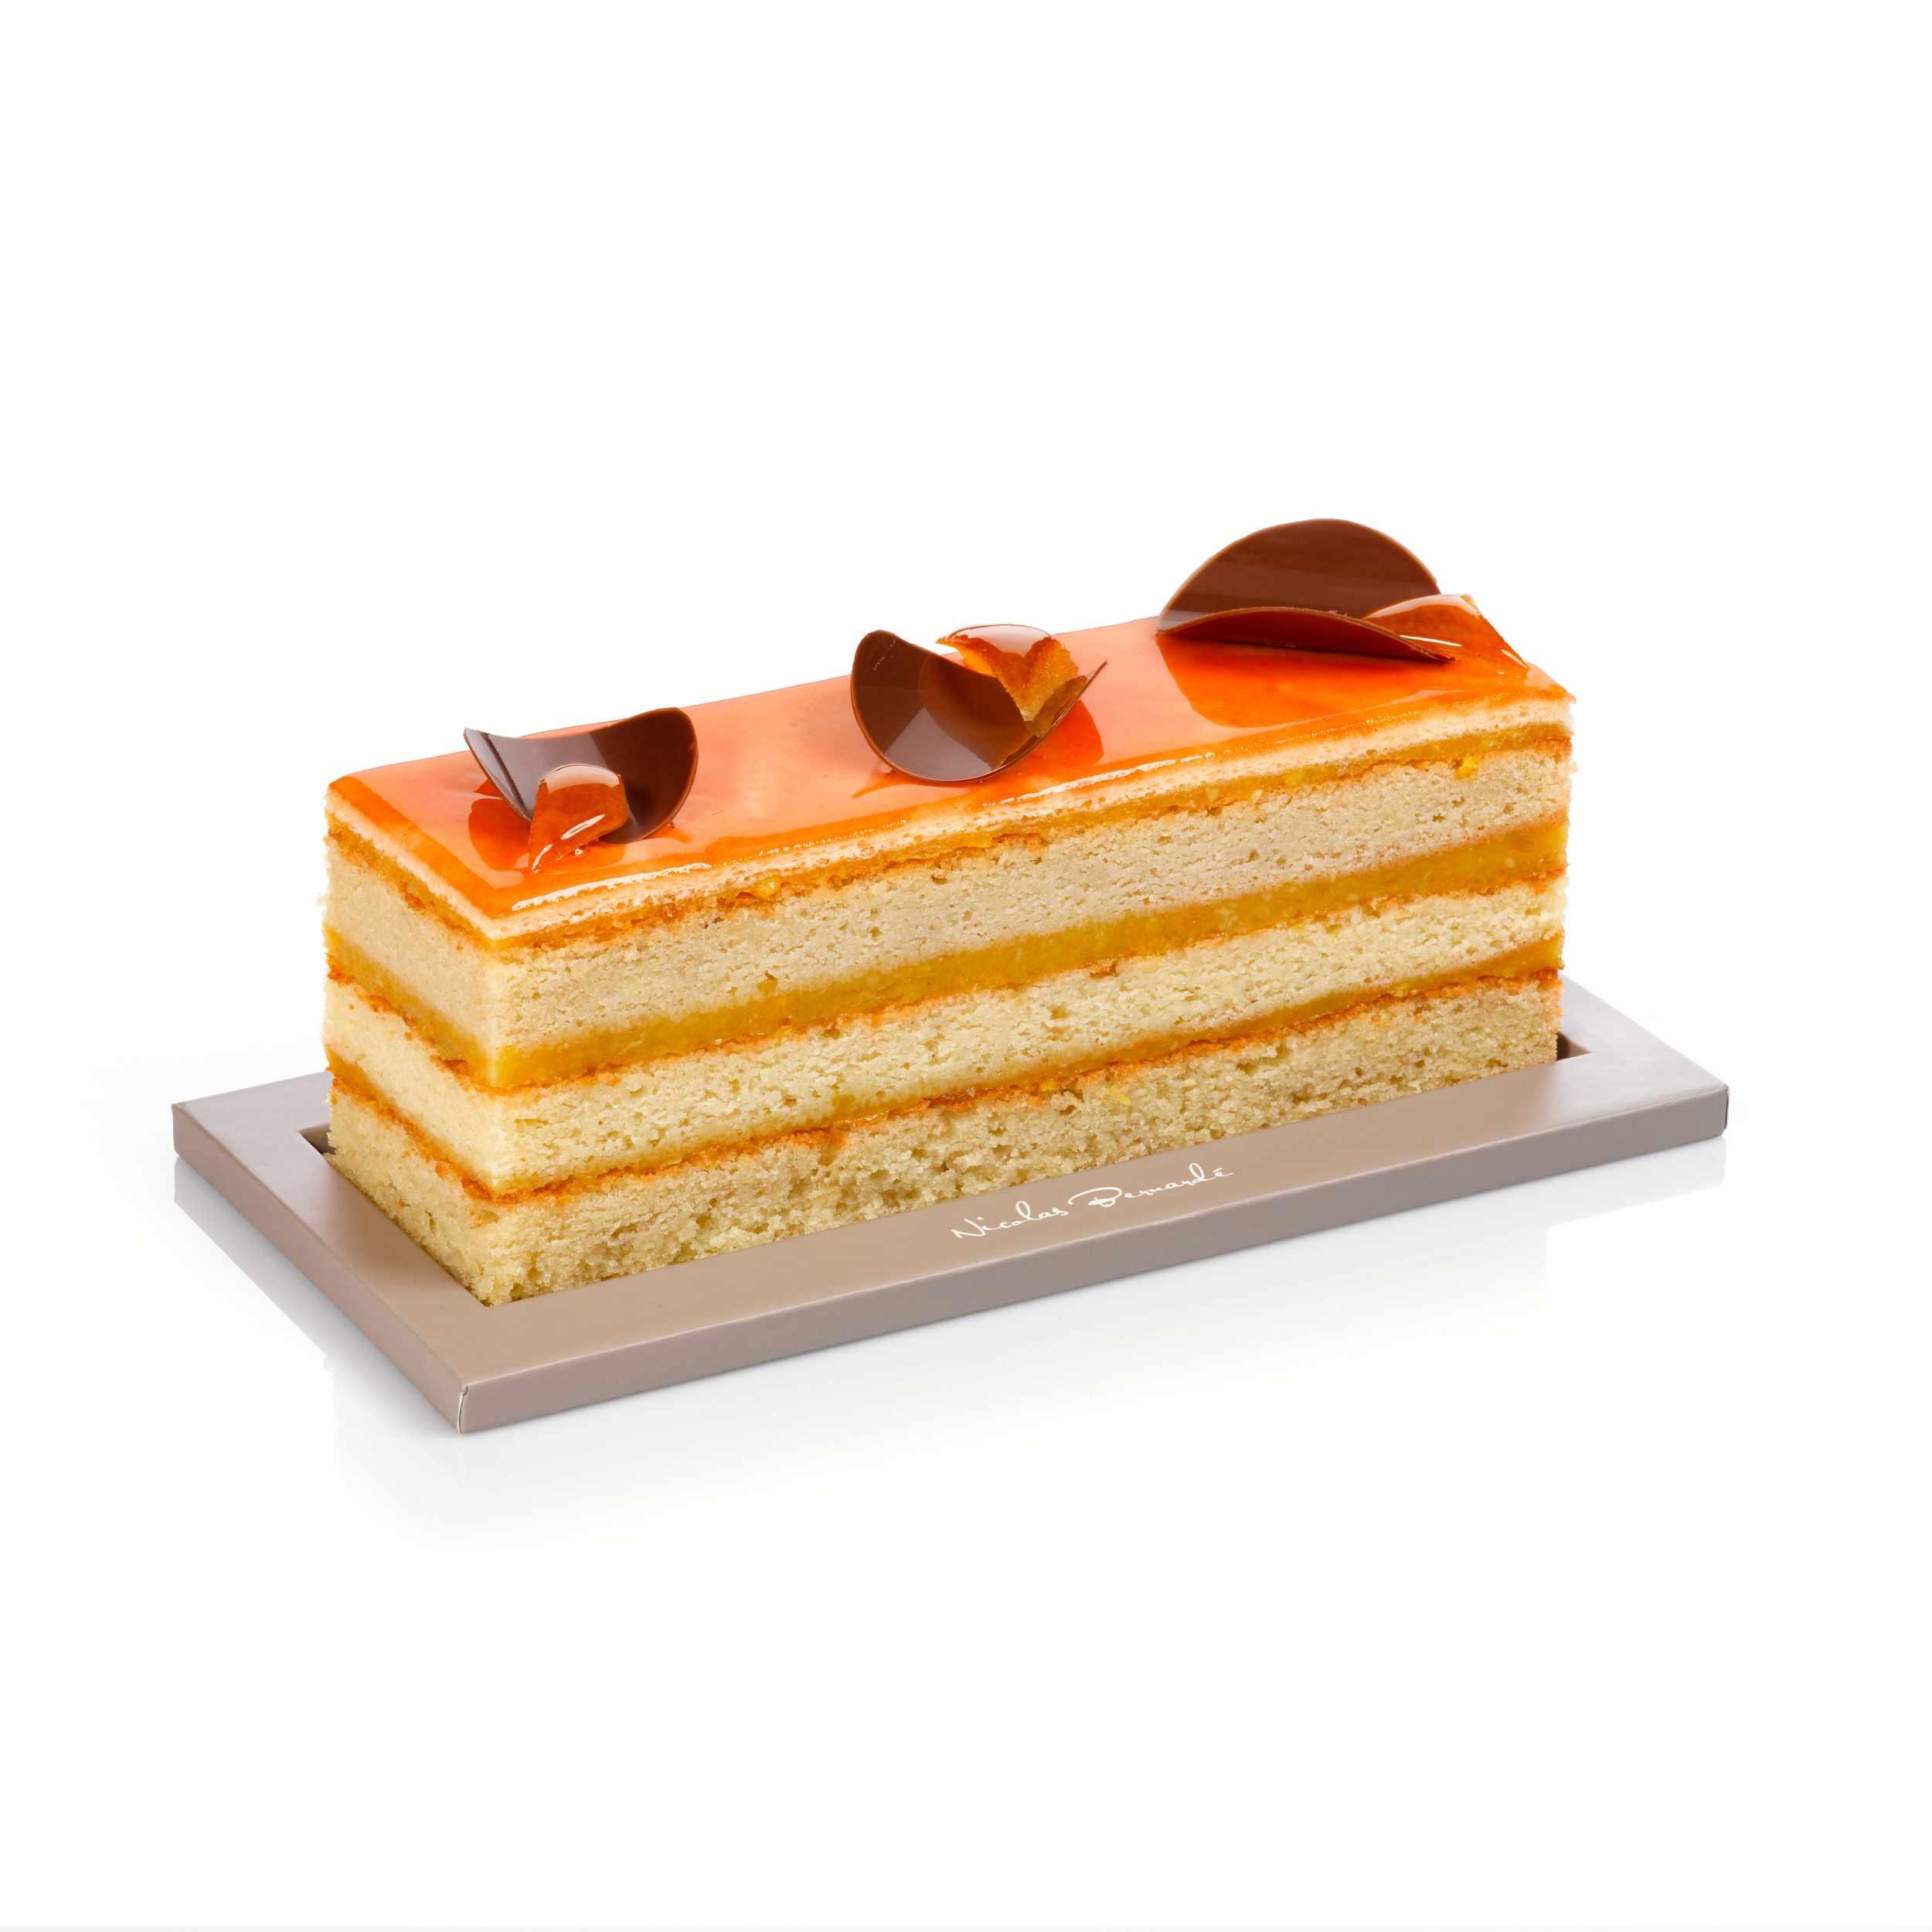 cake-orange.jpg